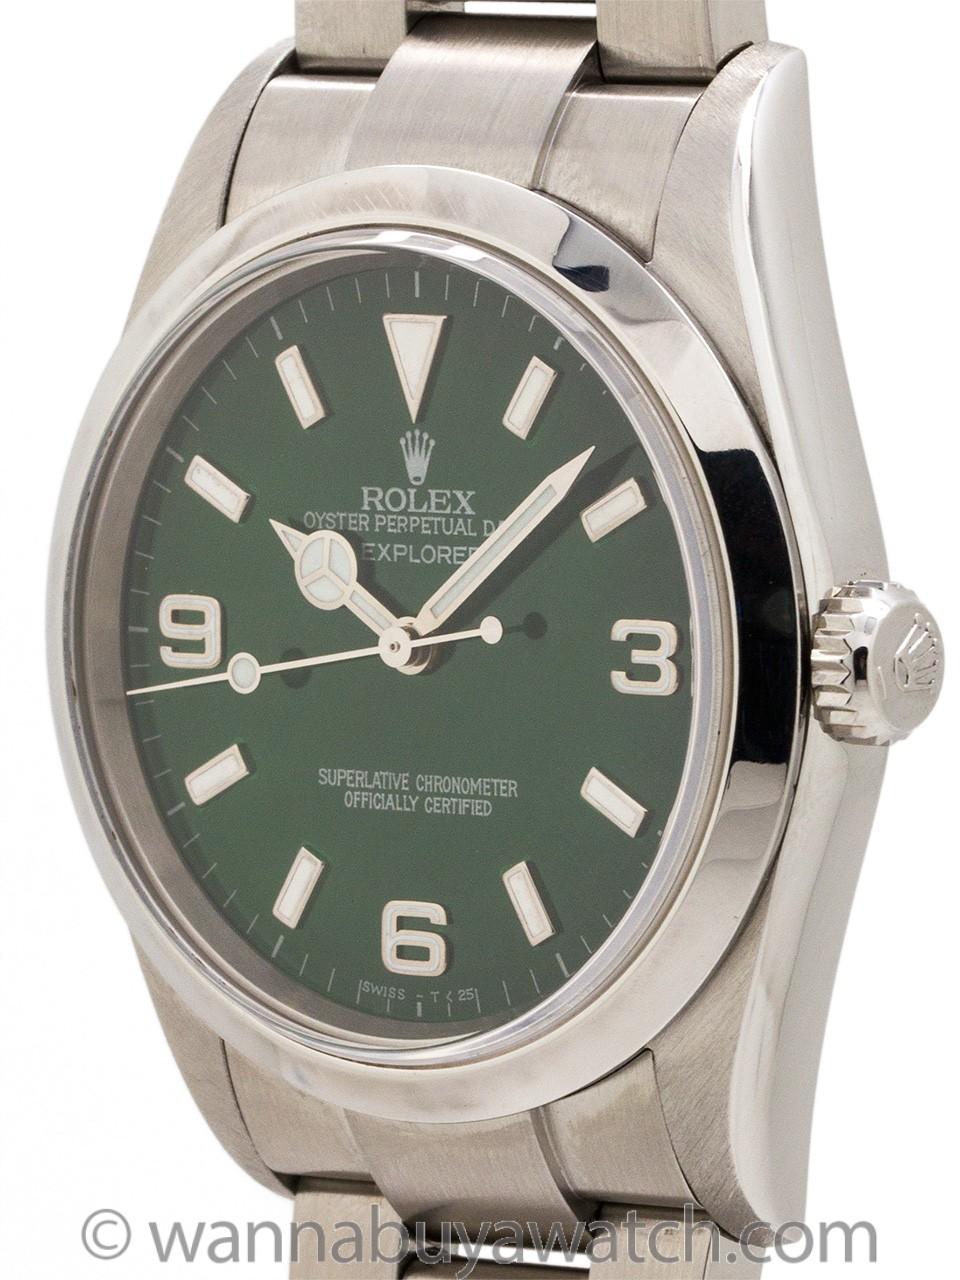 Rolex Explorer 1 ref 114270 Custom Jade Green circa 2003